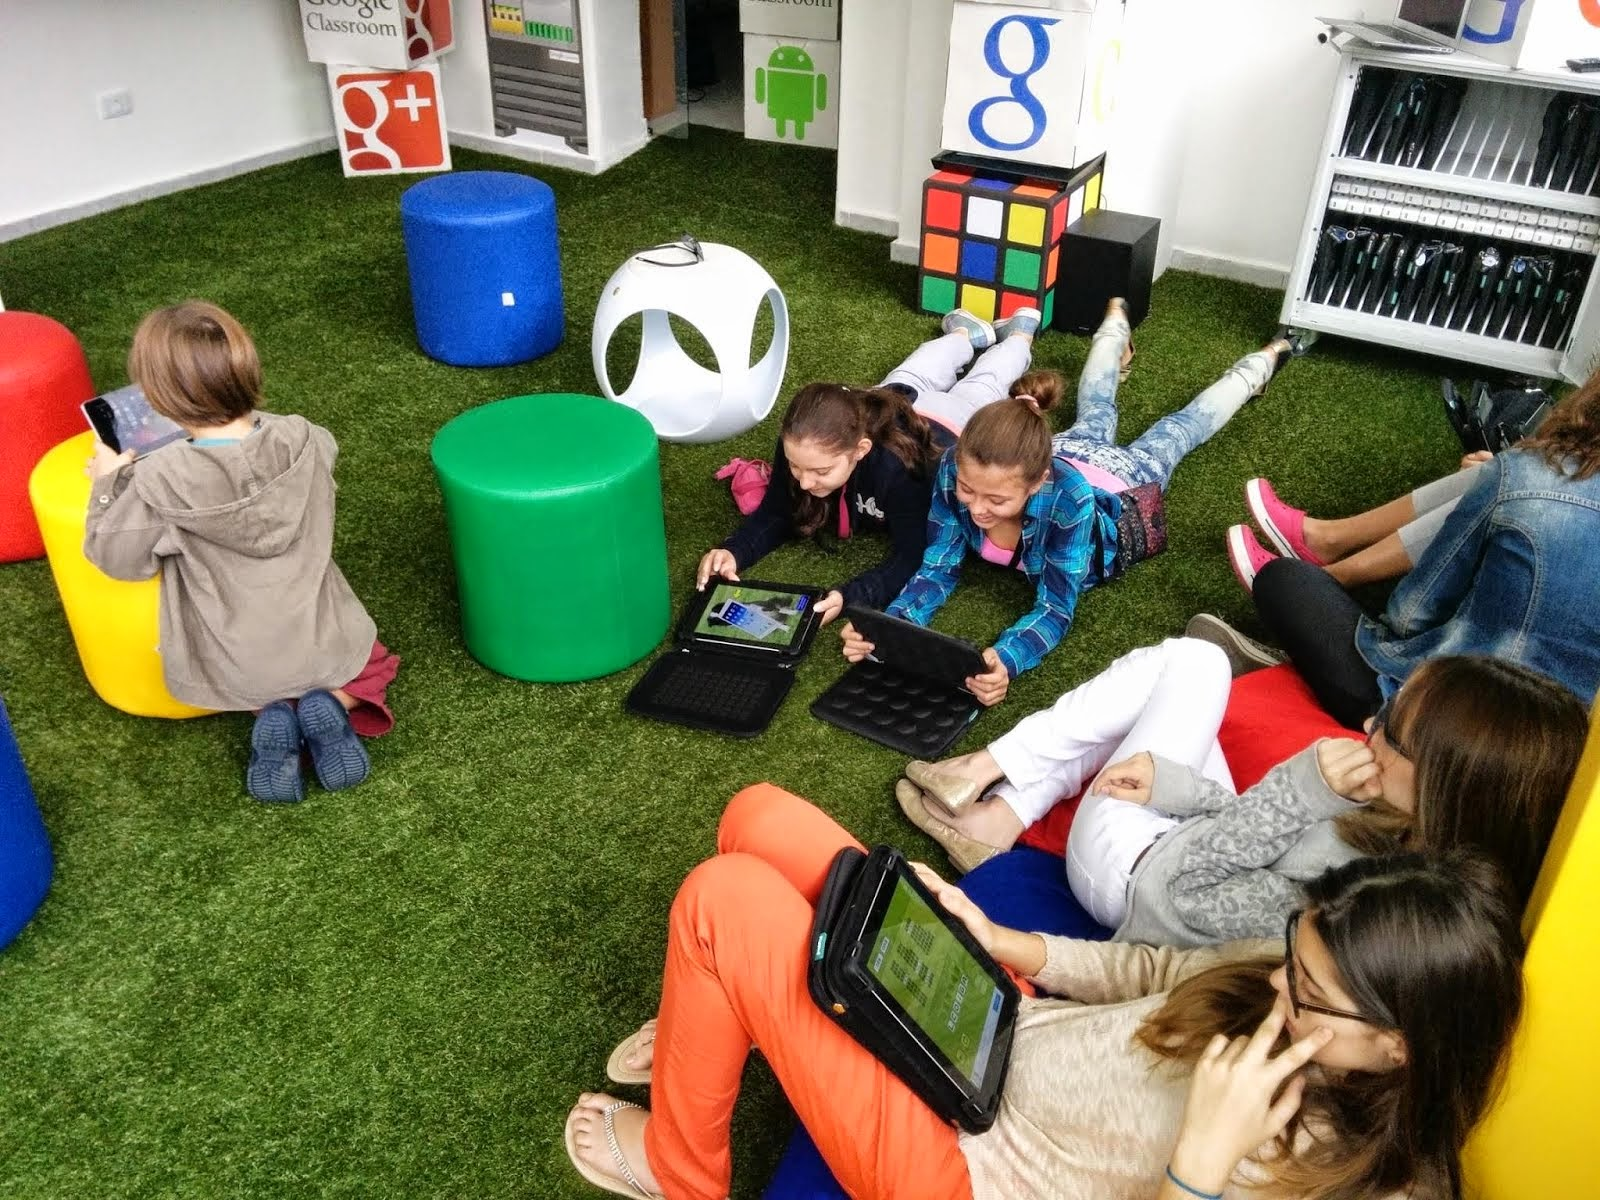 Schools Interactive Games Free Download Programs